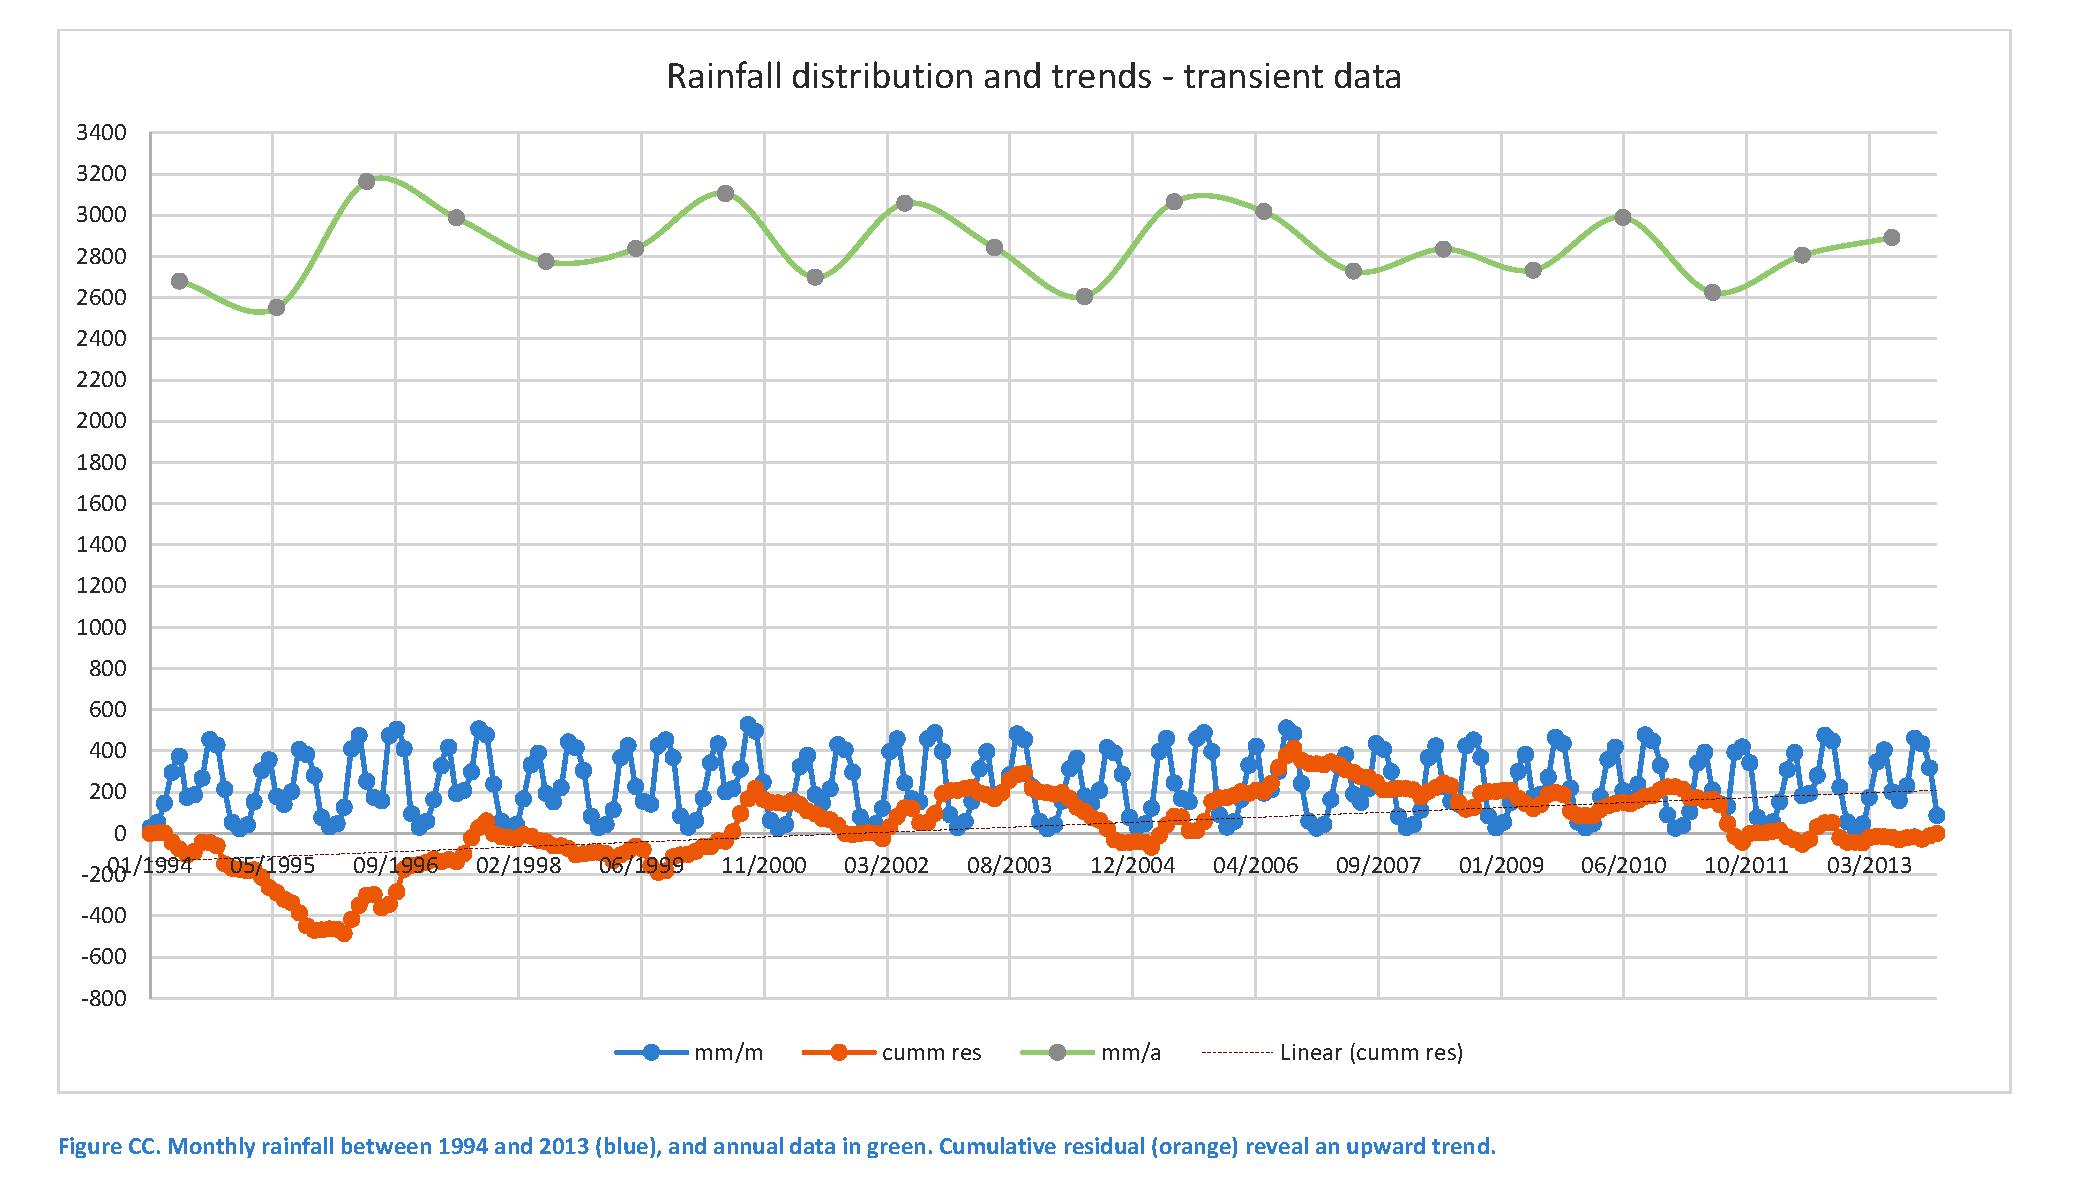 Cumul. resid. rainfall